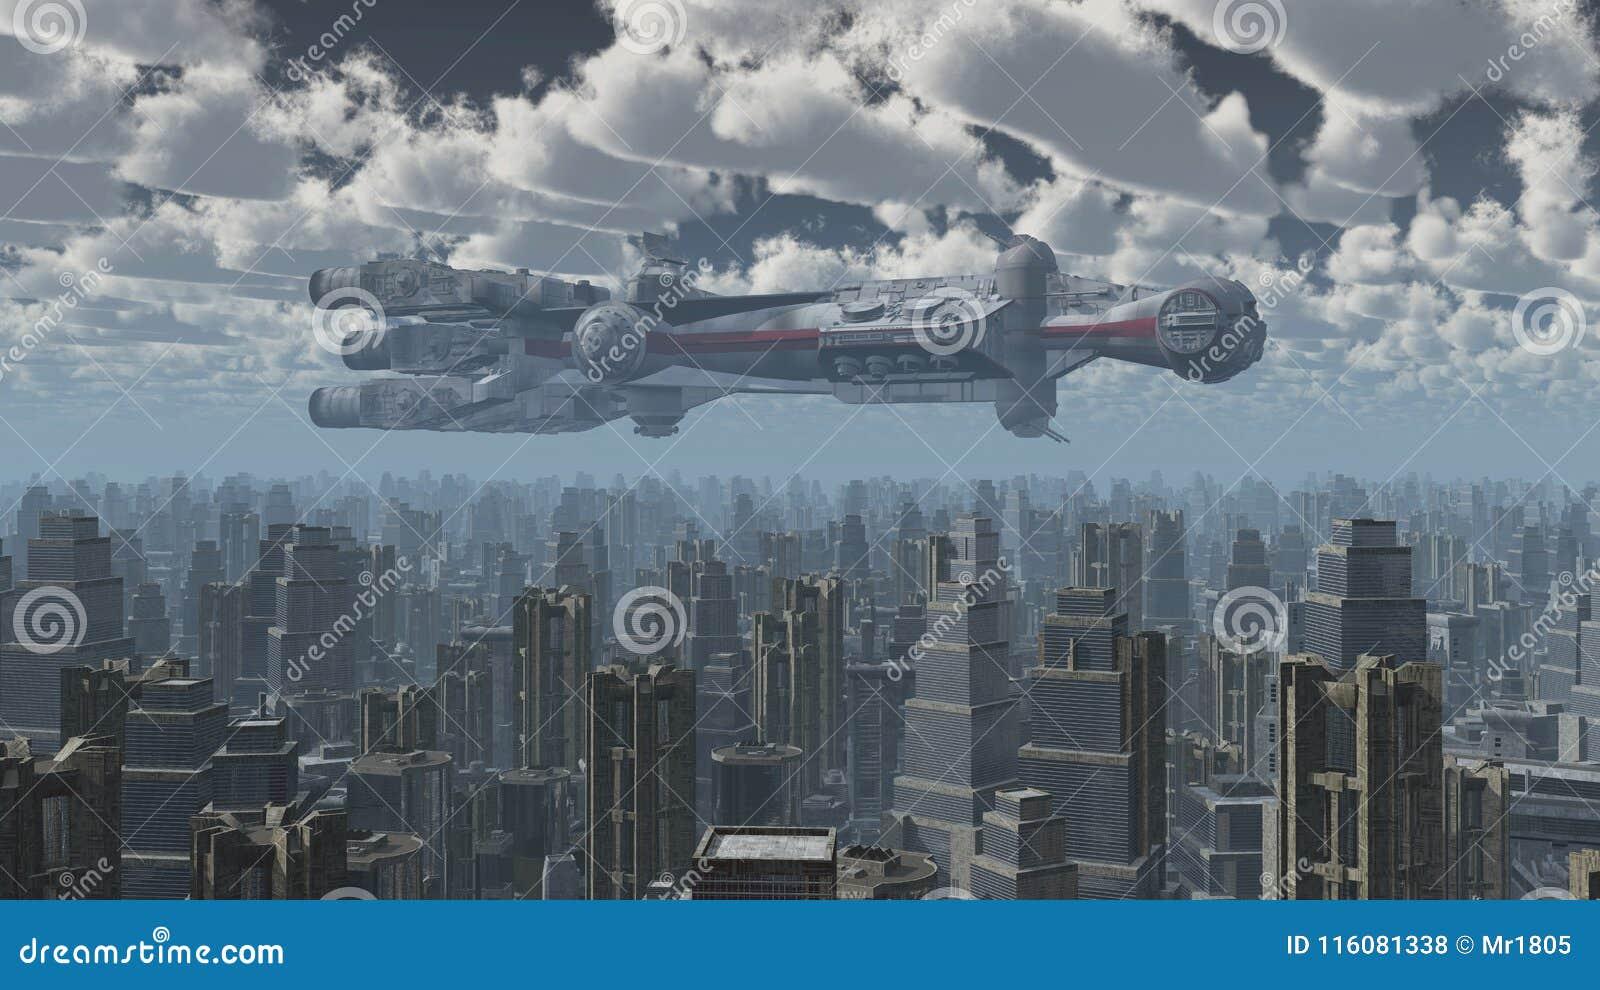 Huge spaceship over a big city